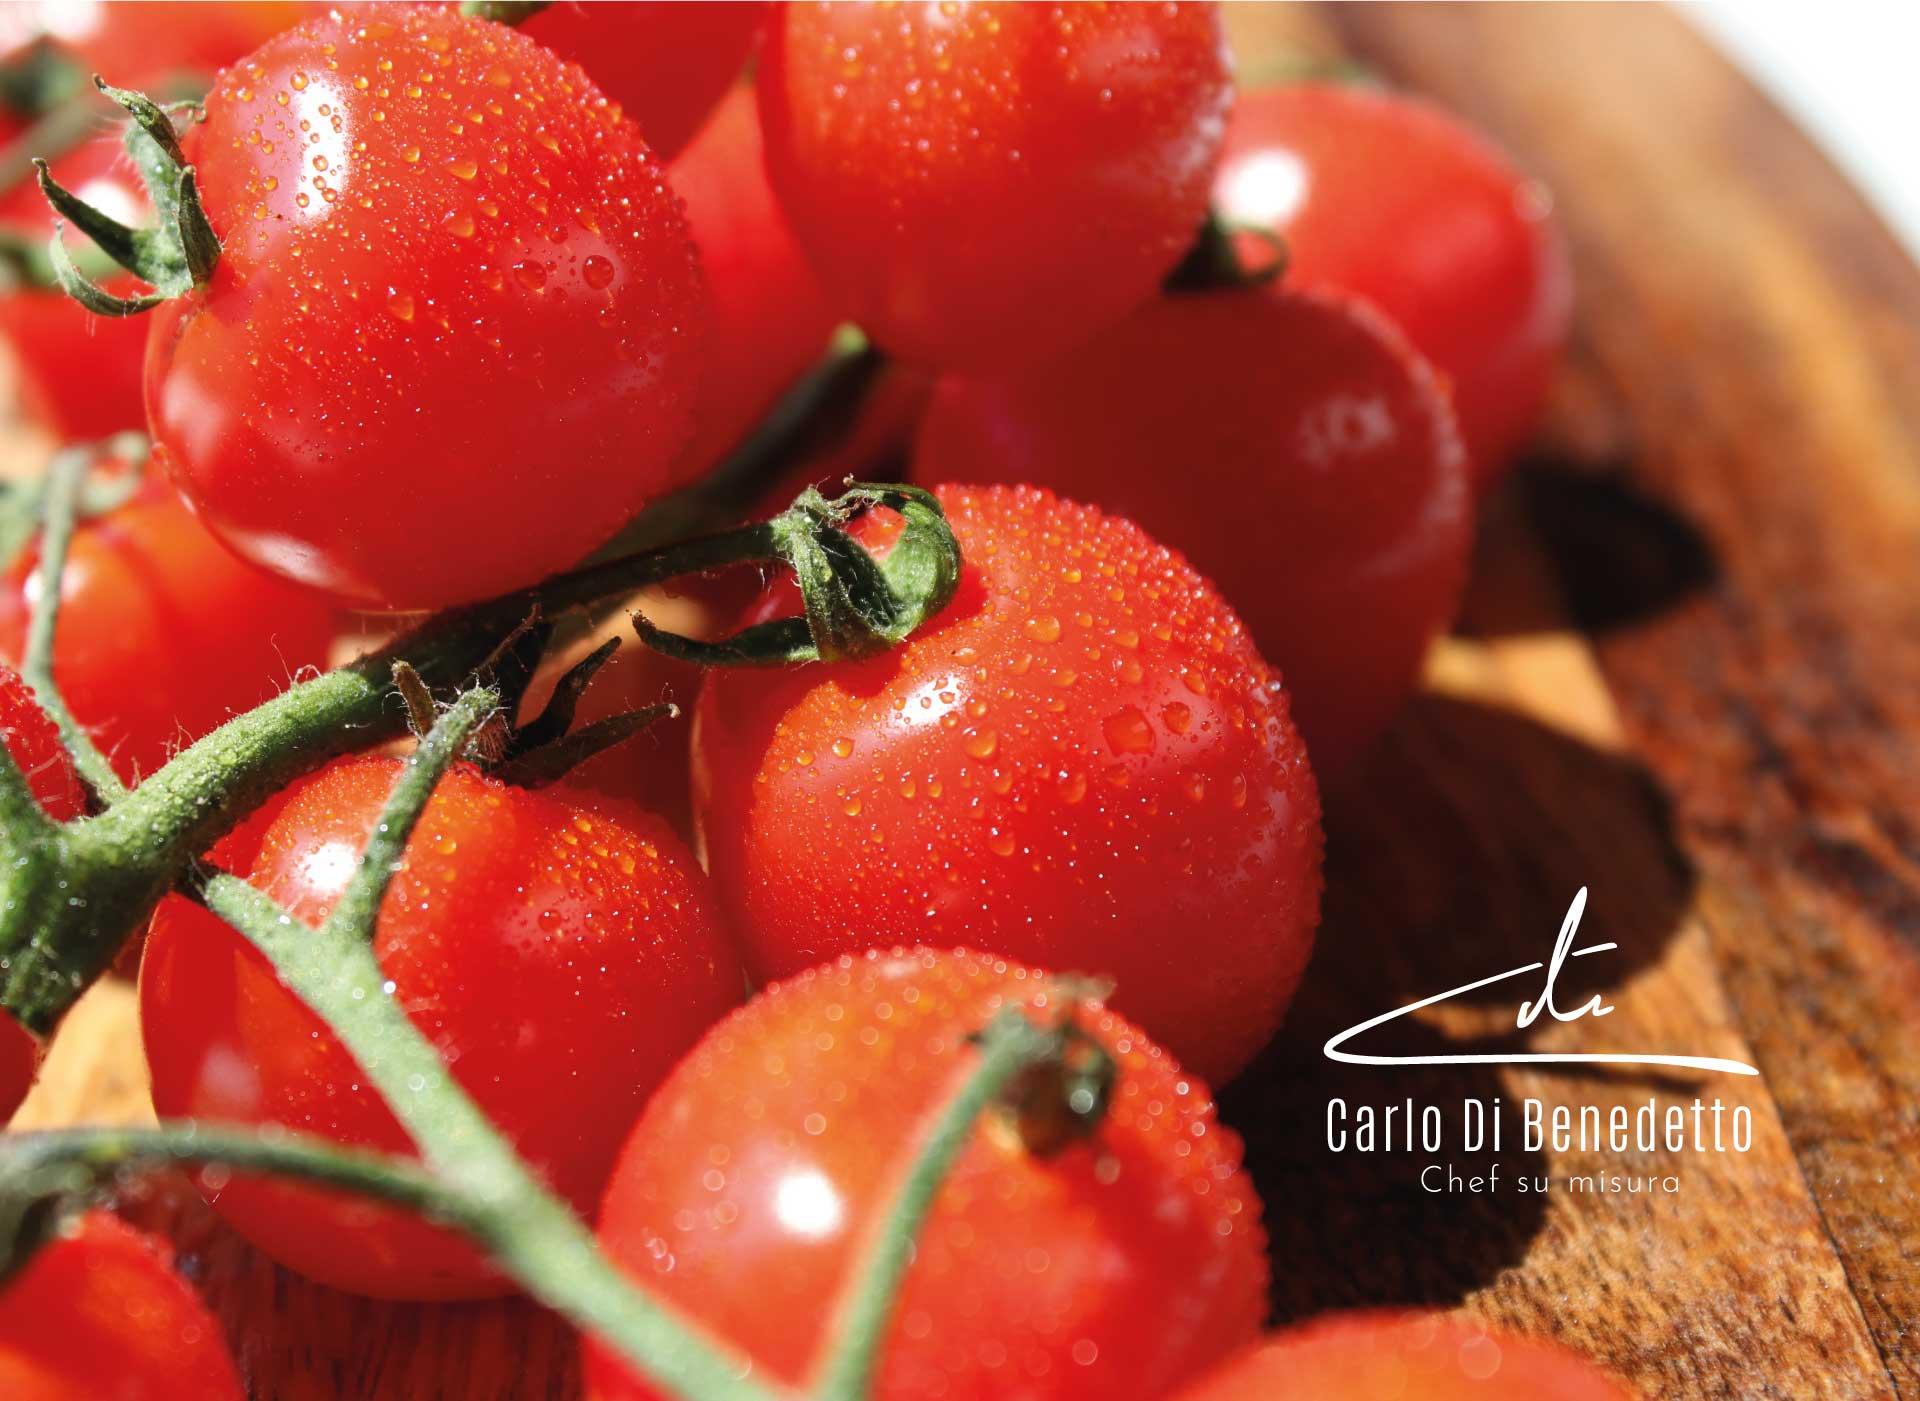 foto carlo dibenedetto chef branding logo moodmama portfolio